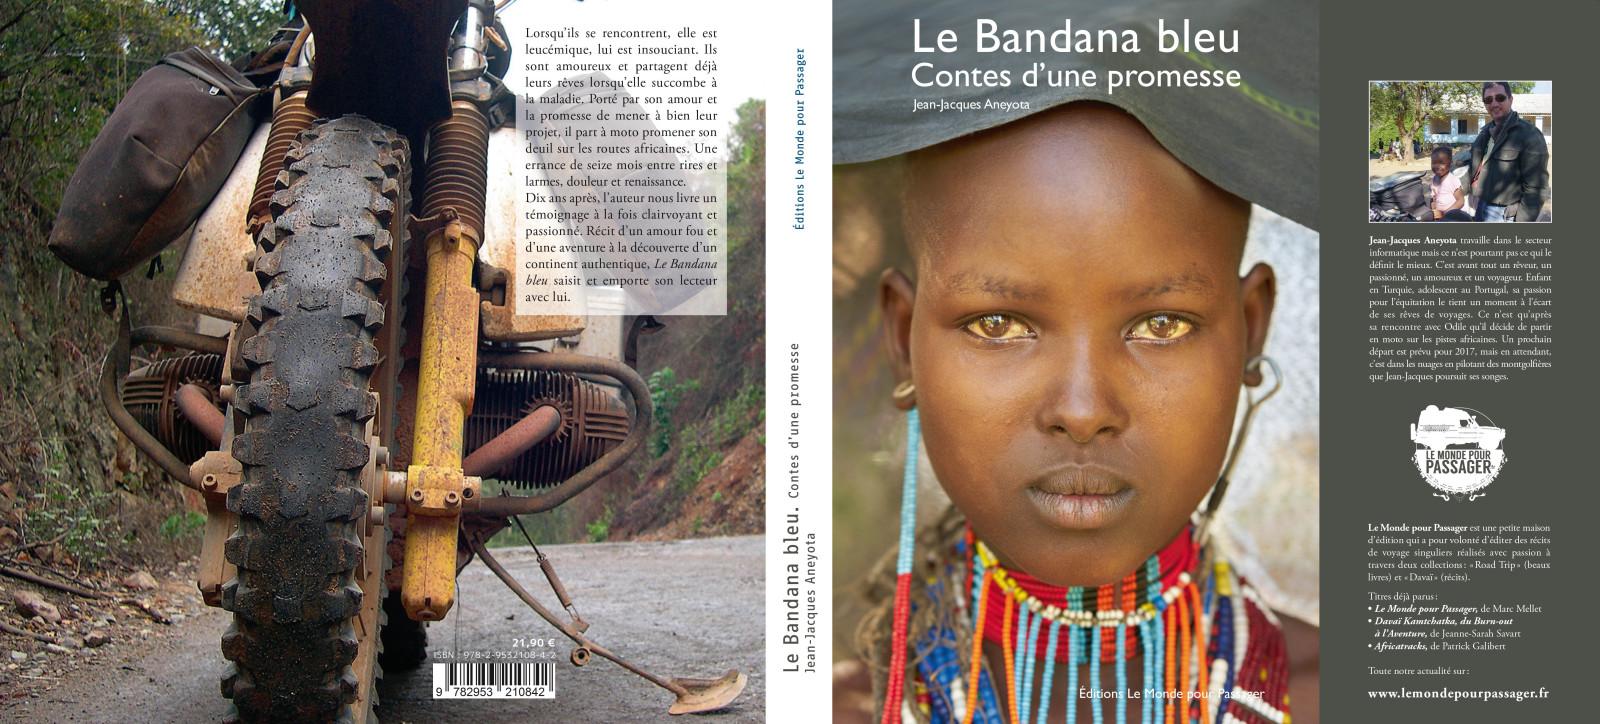 Couverture_BandanaBleu.indd